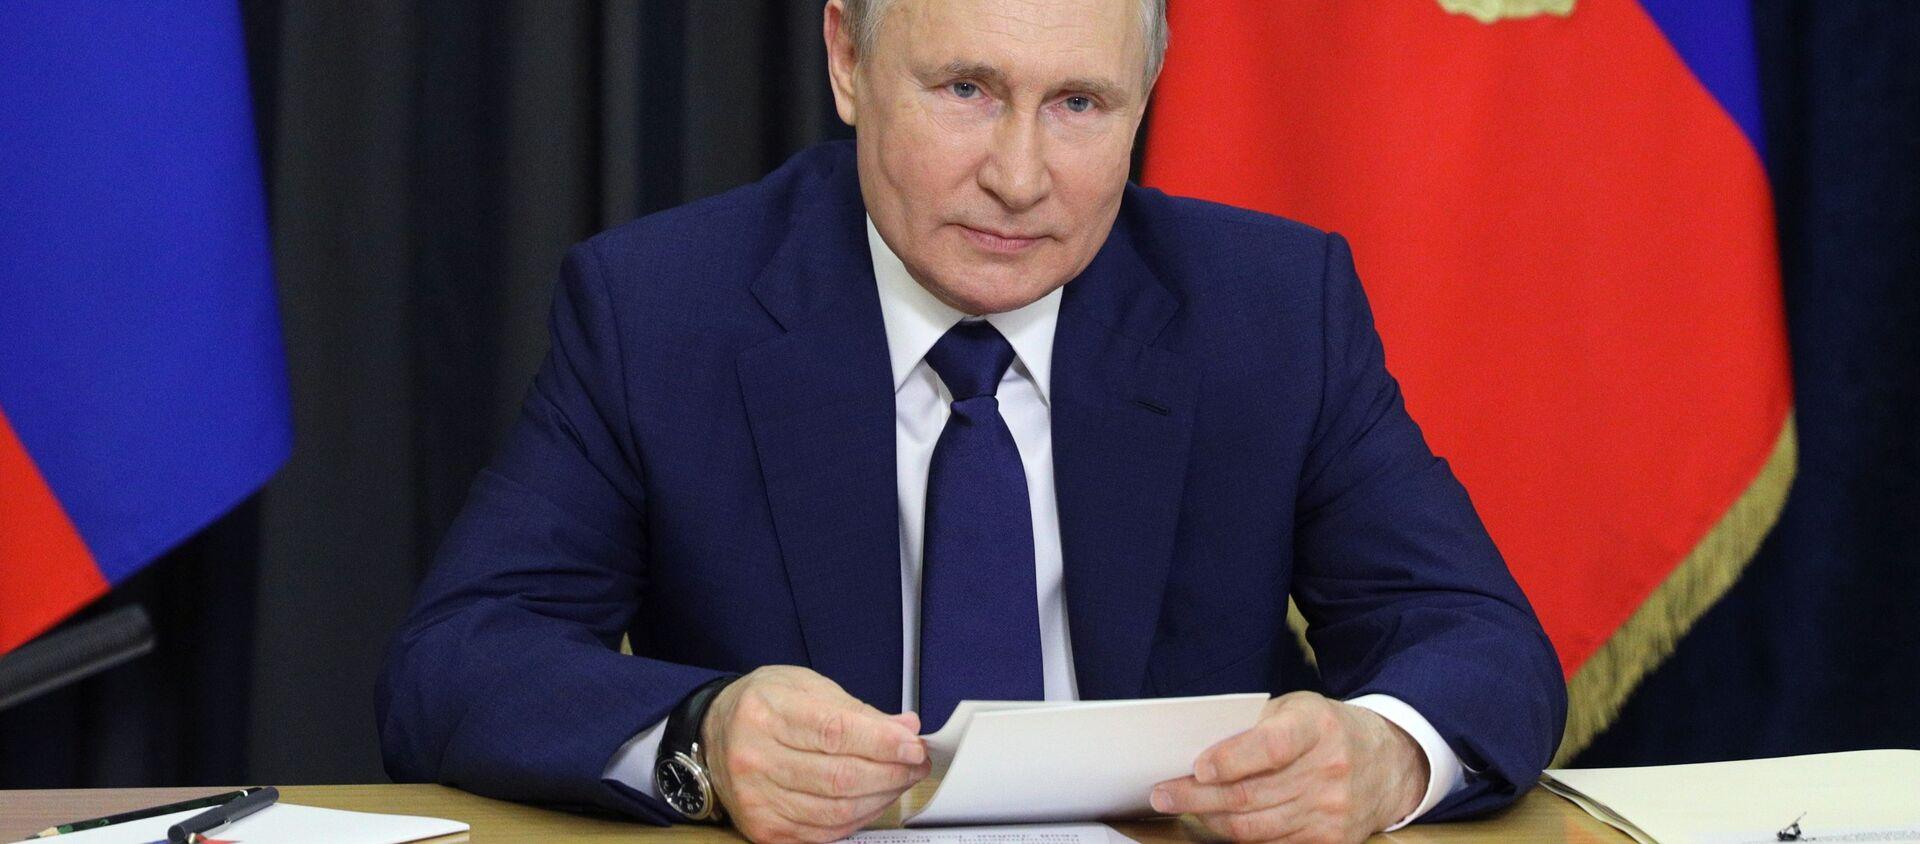 Tổng thống Nga Vladimir Putin. - Sputnik Việt Nam, 1920, 10.06.2021